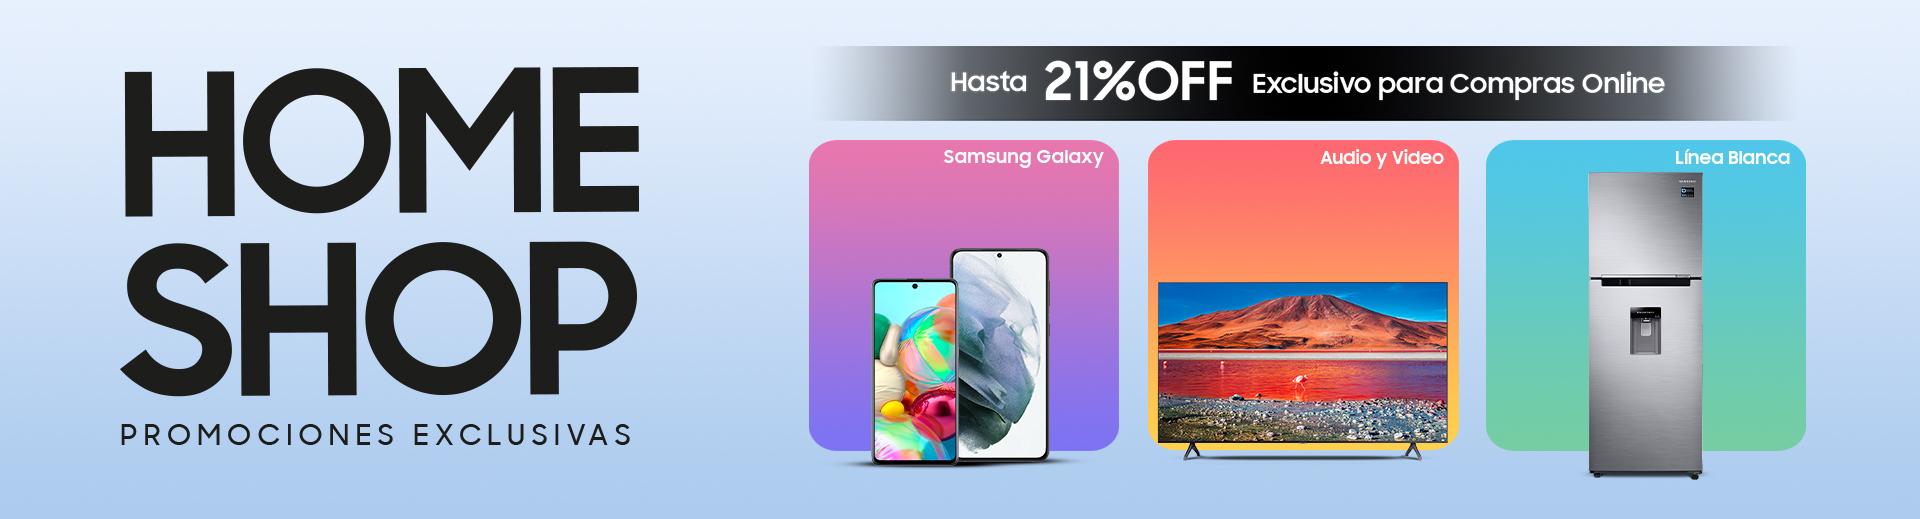 HomeShop Samsung